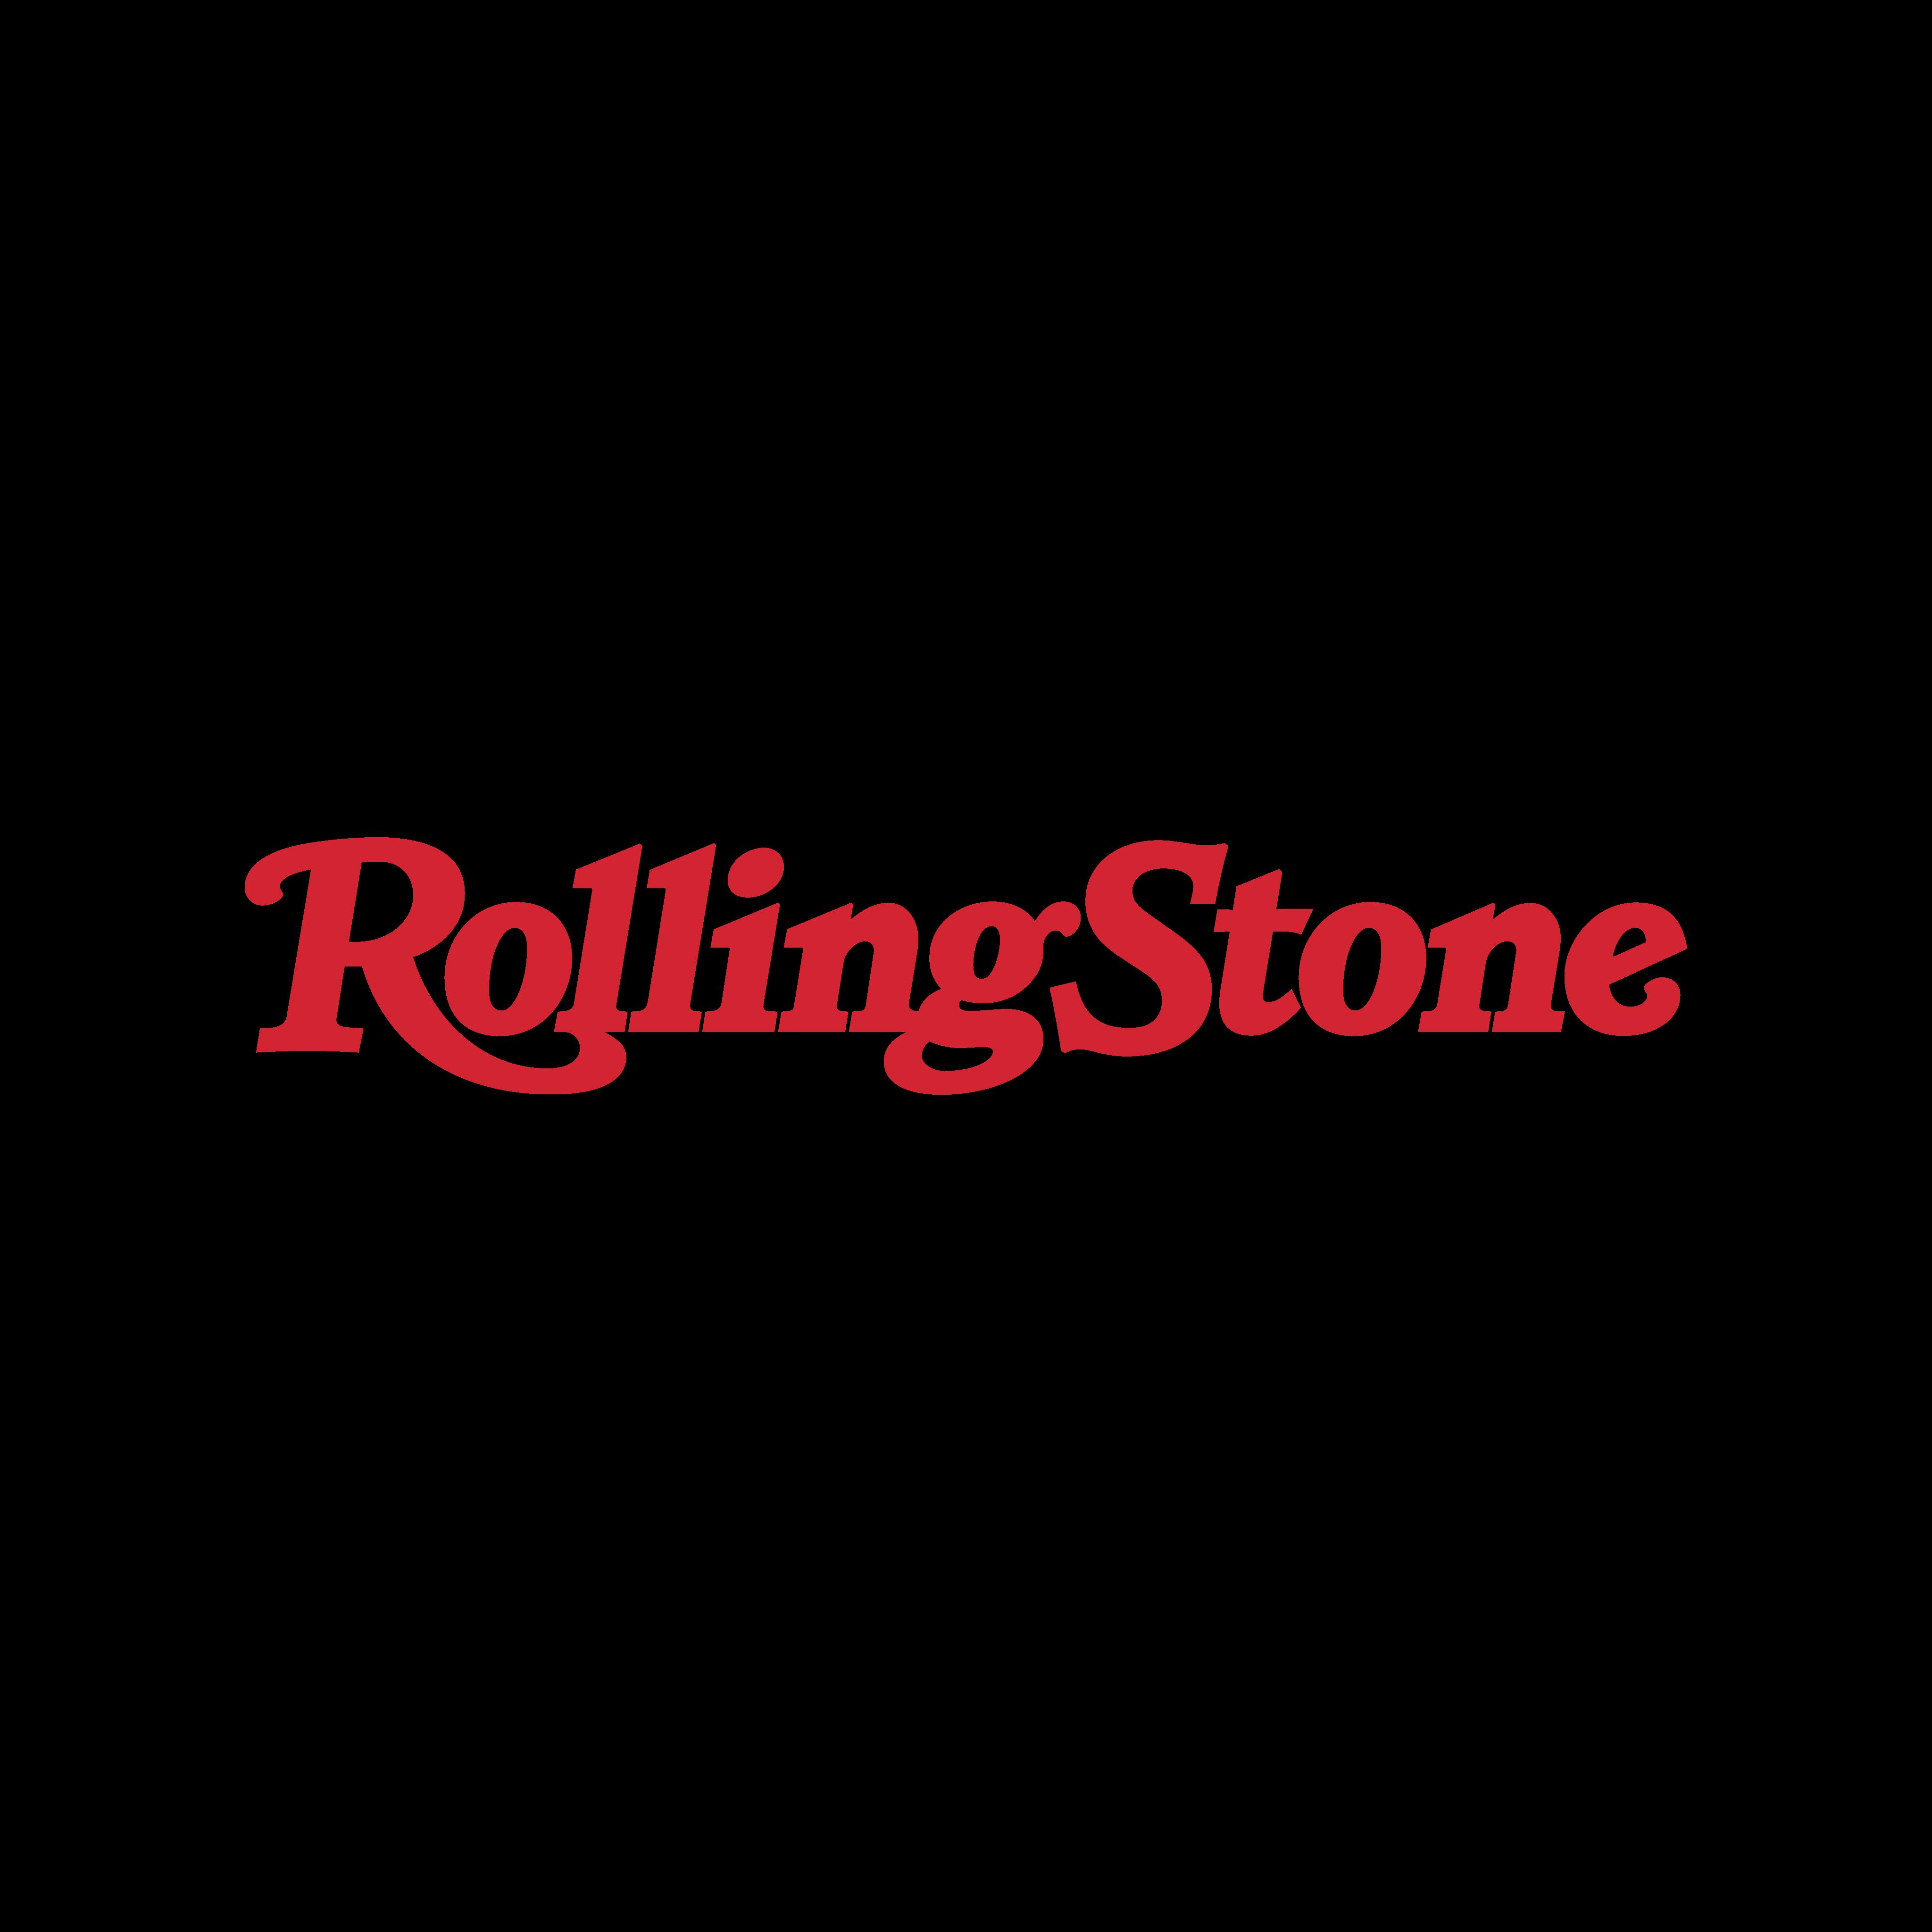 rolling stone logo 0 - Rolling Stone Logo